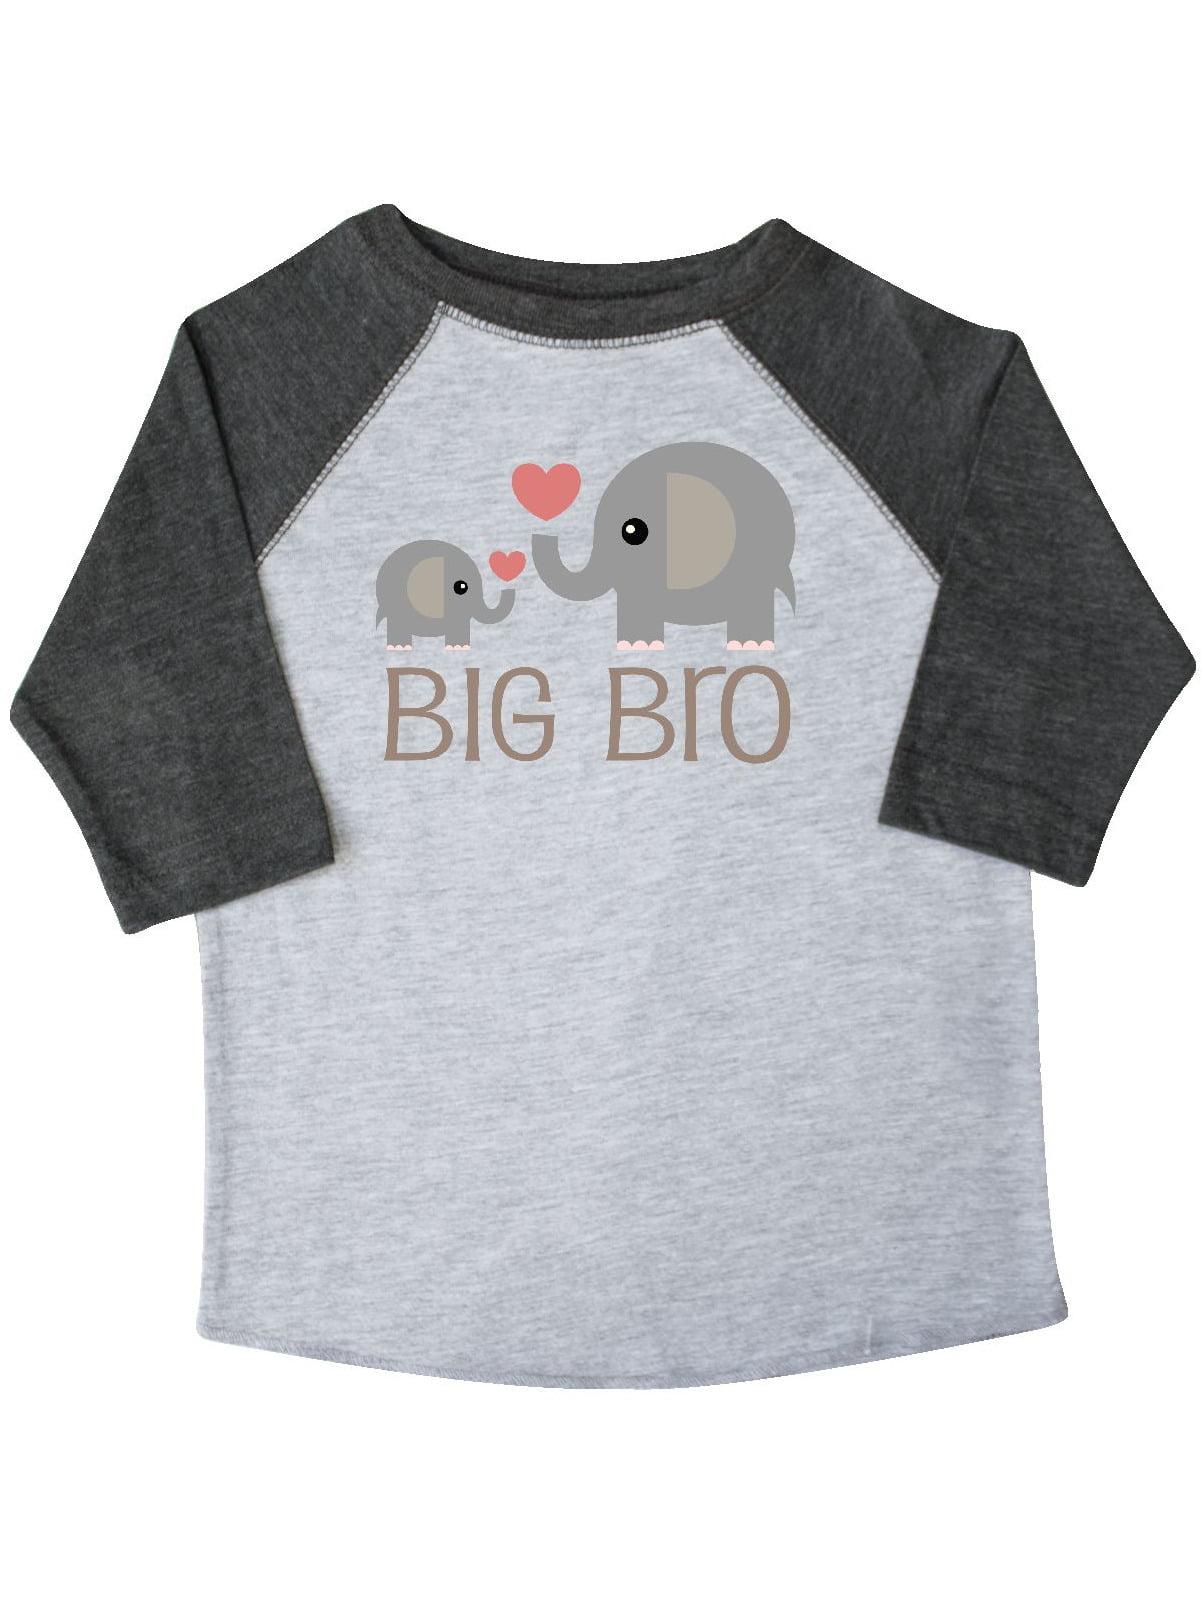 Big Bro Boys Elephant Brother Announcement Toddler T-Shirt